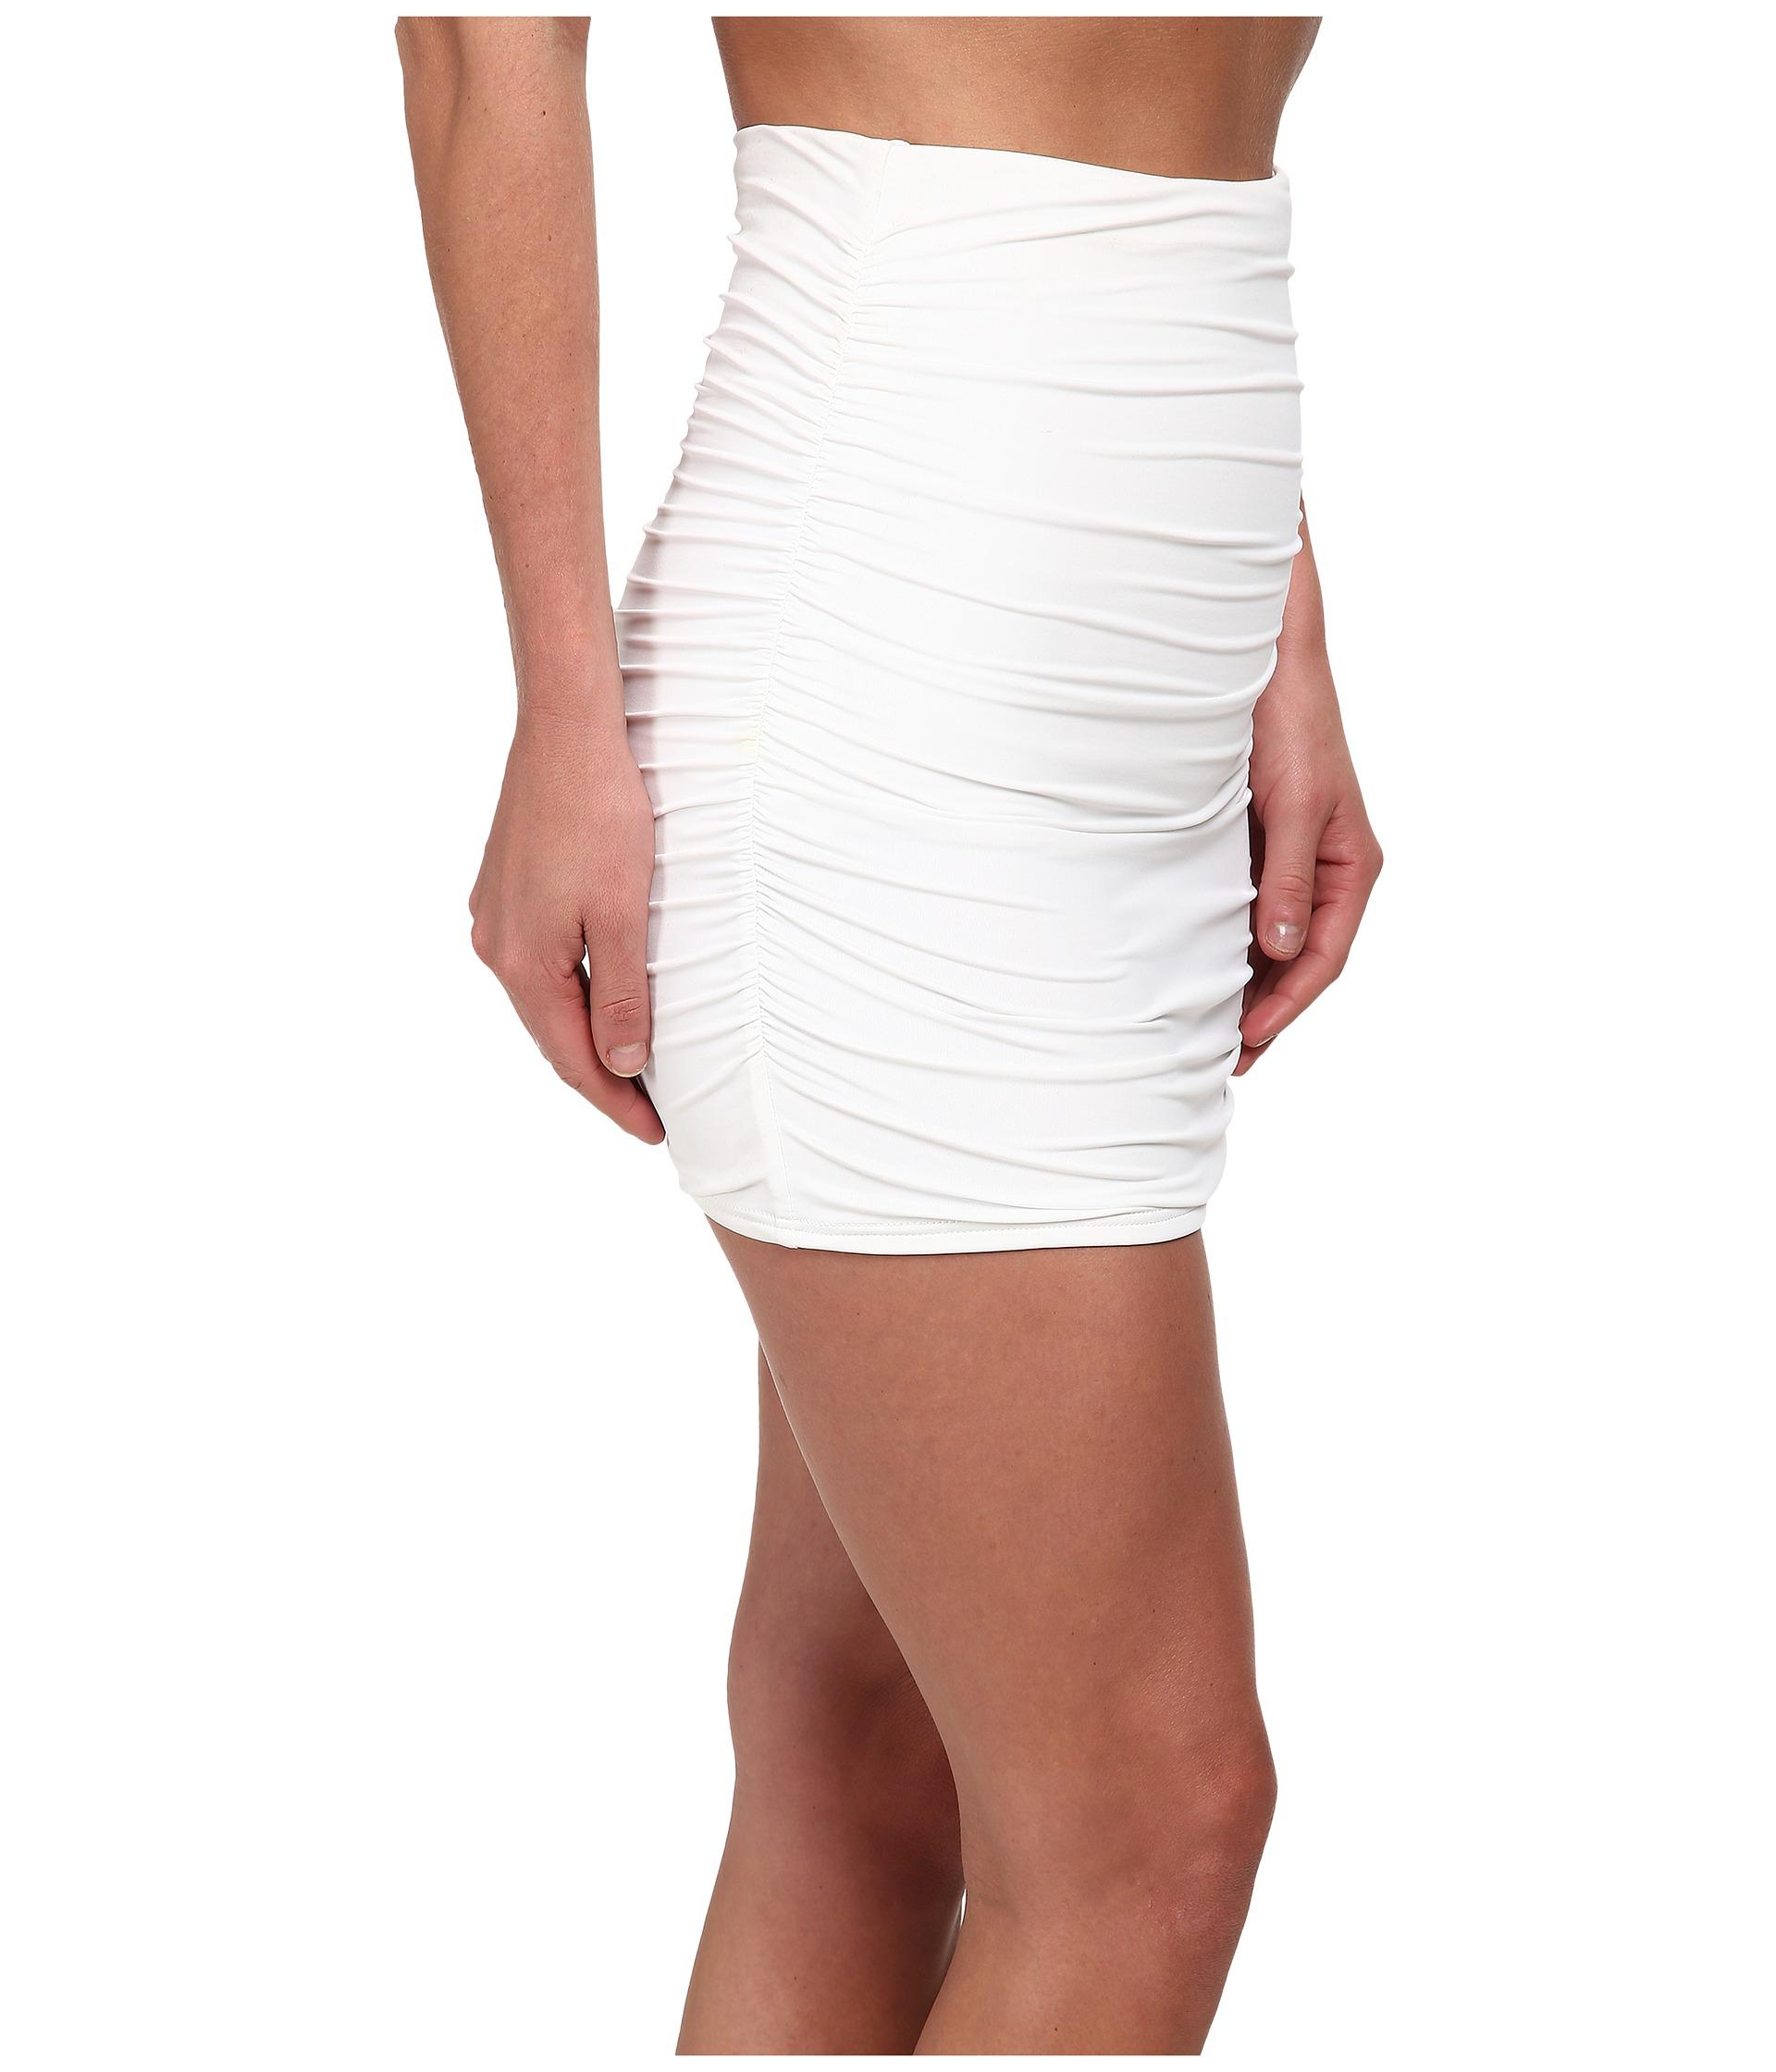 f13da518df18f Anne Cole Women S Color Blast Solids Super High Waist Shape Control Tankini  With Skirted Bottom. High Waisted Swim Skirt Bottom Latest And Best Model  2018